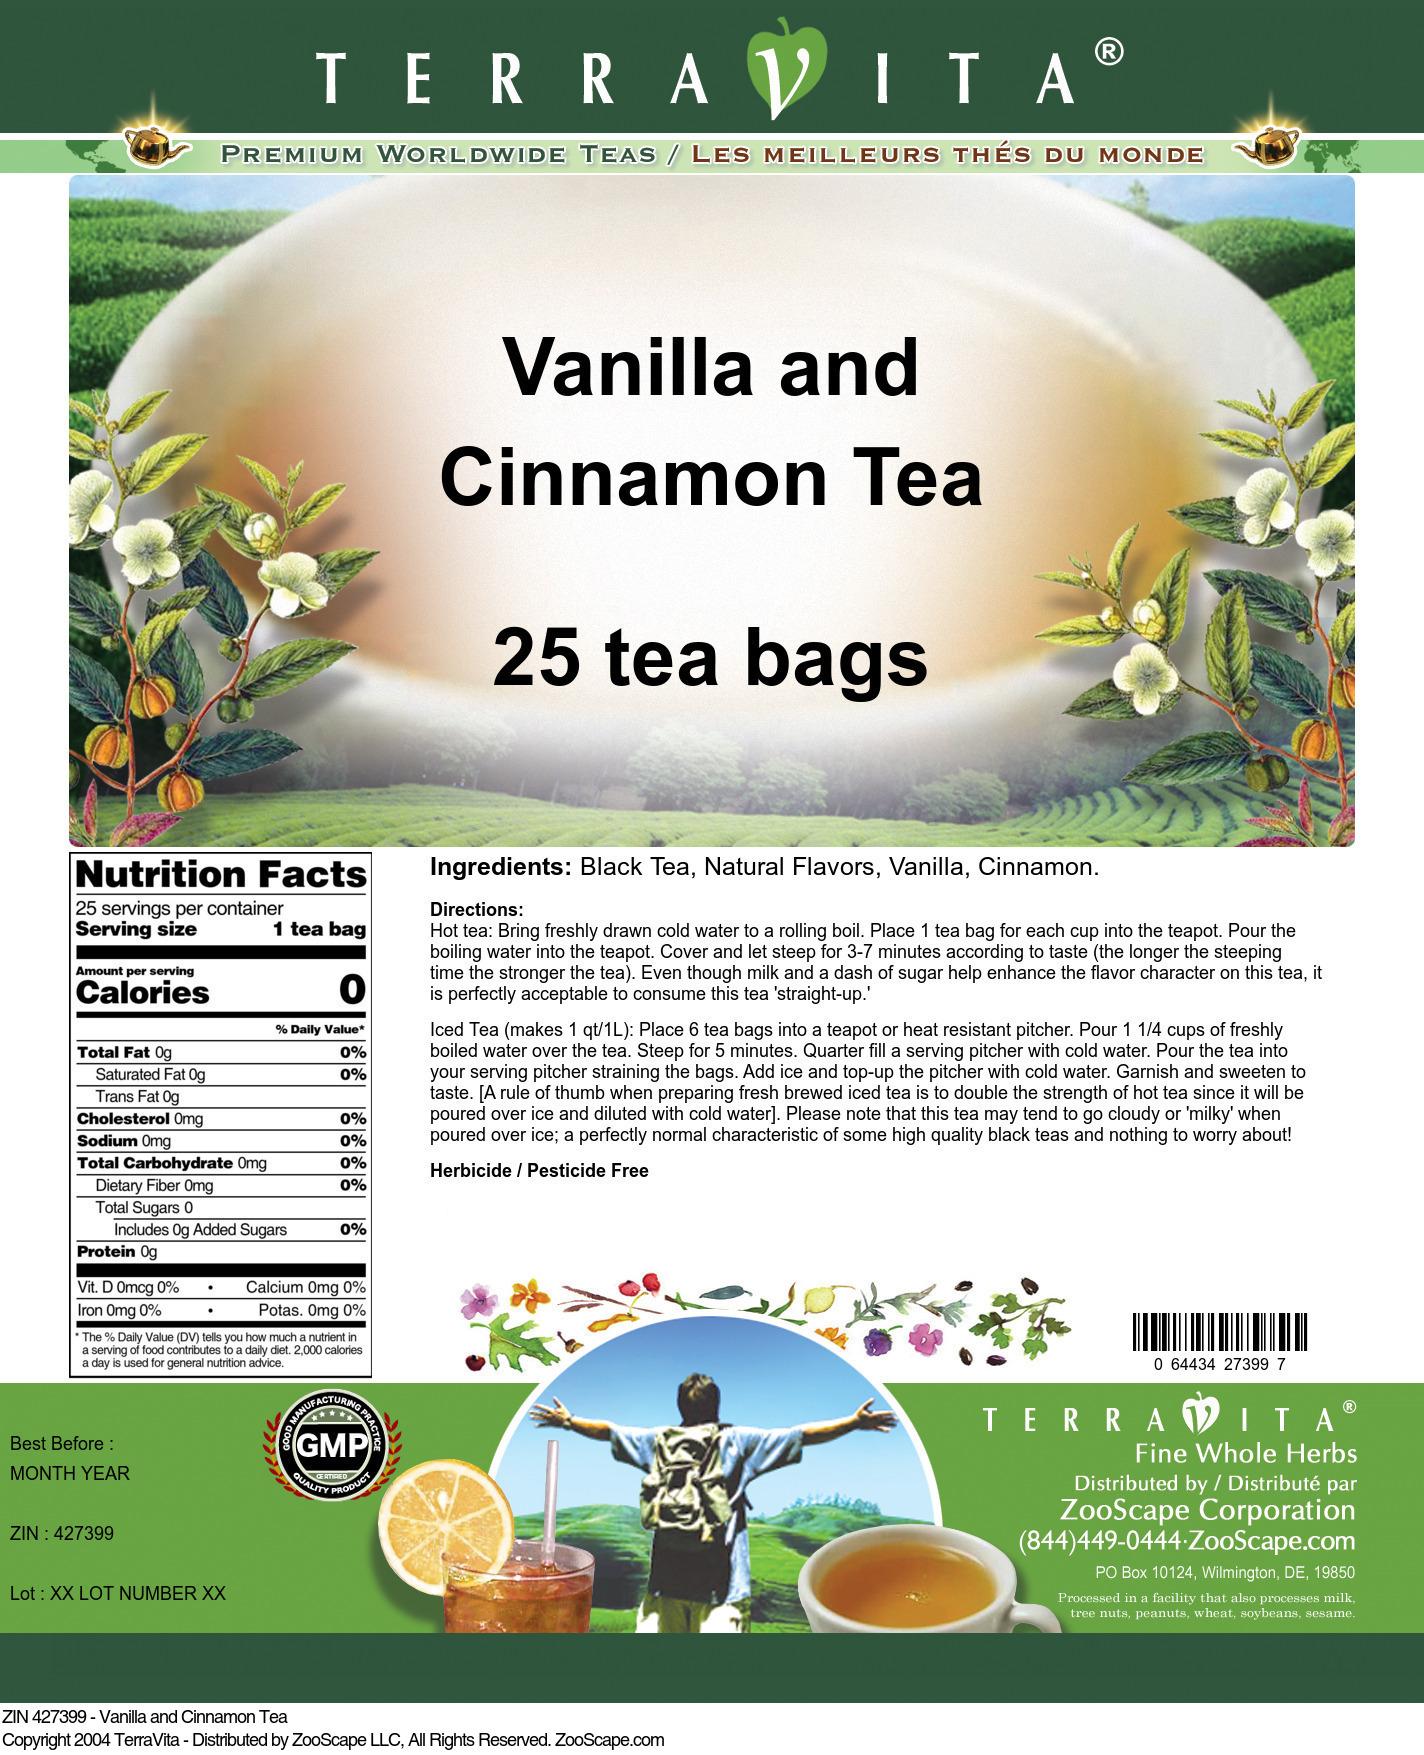 Vanilla and Cinnamon Tea